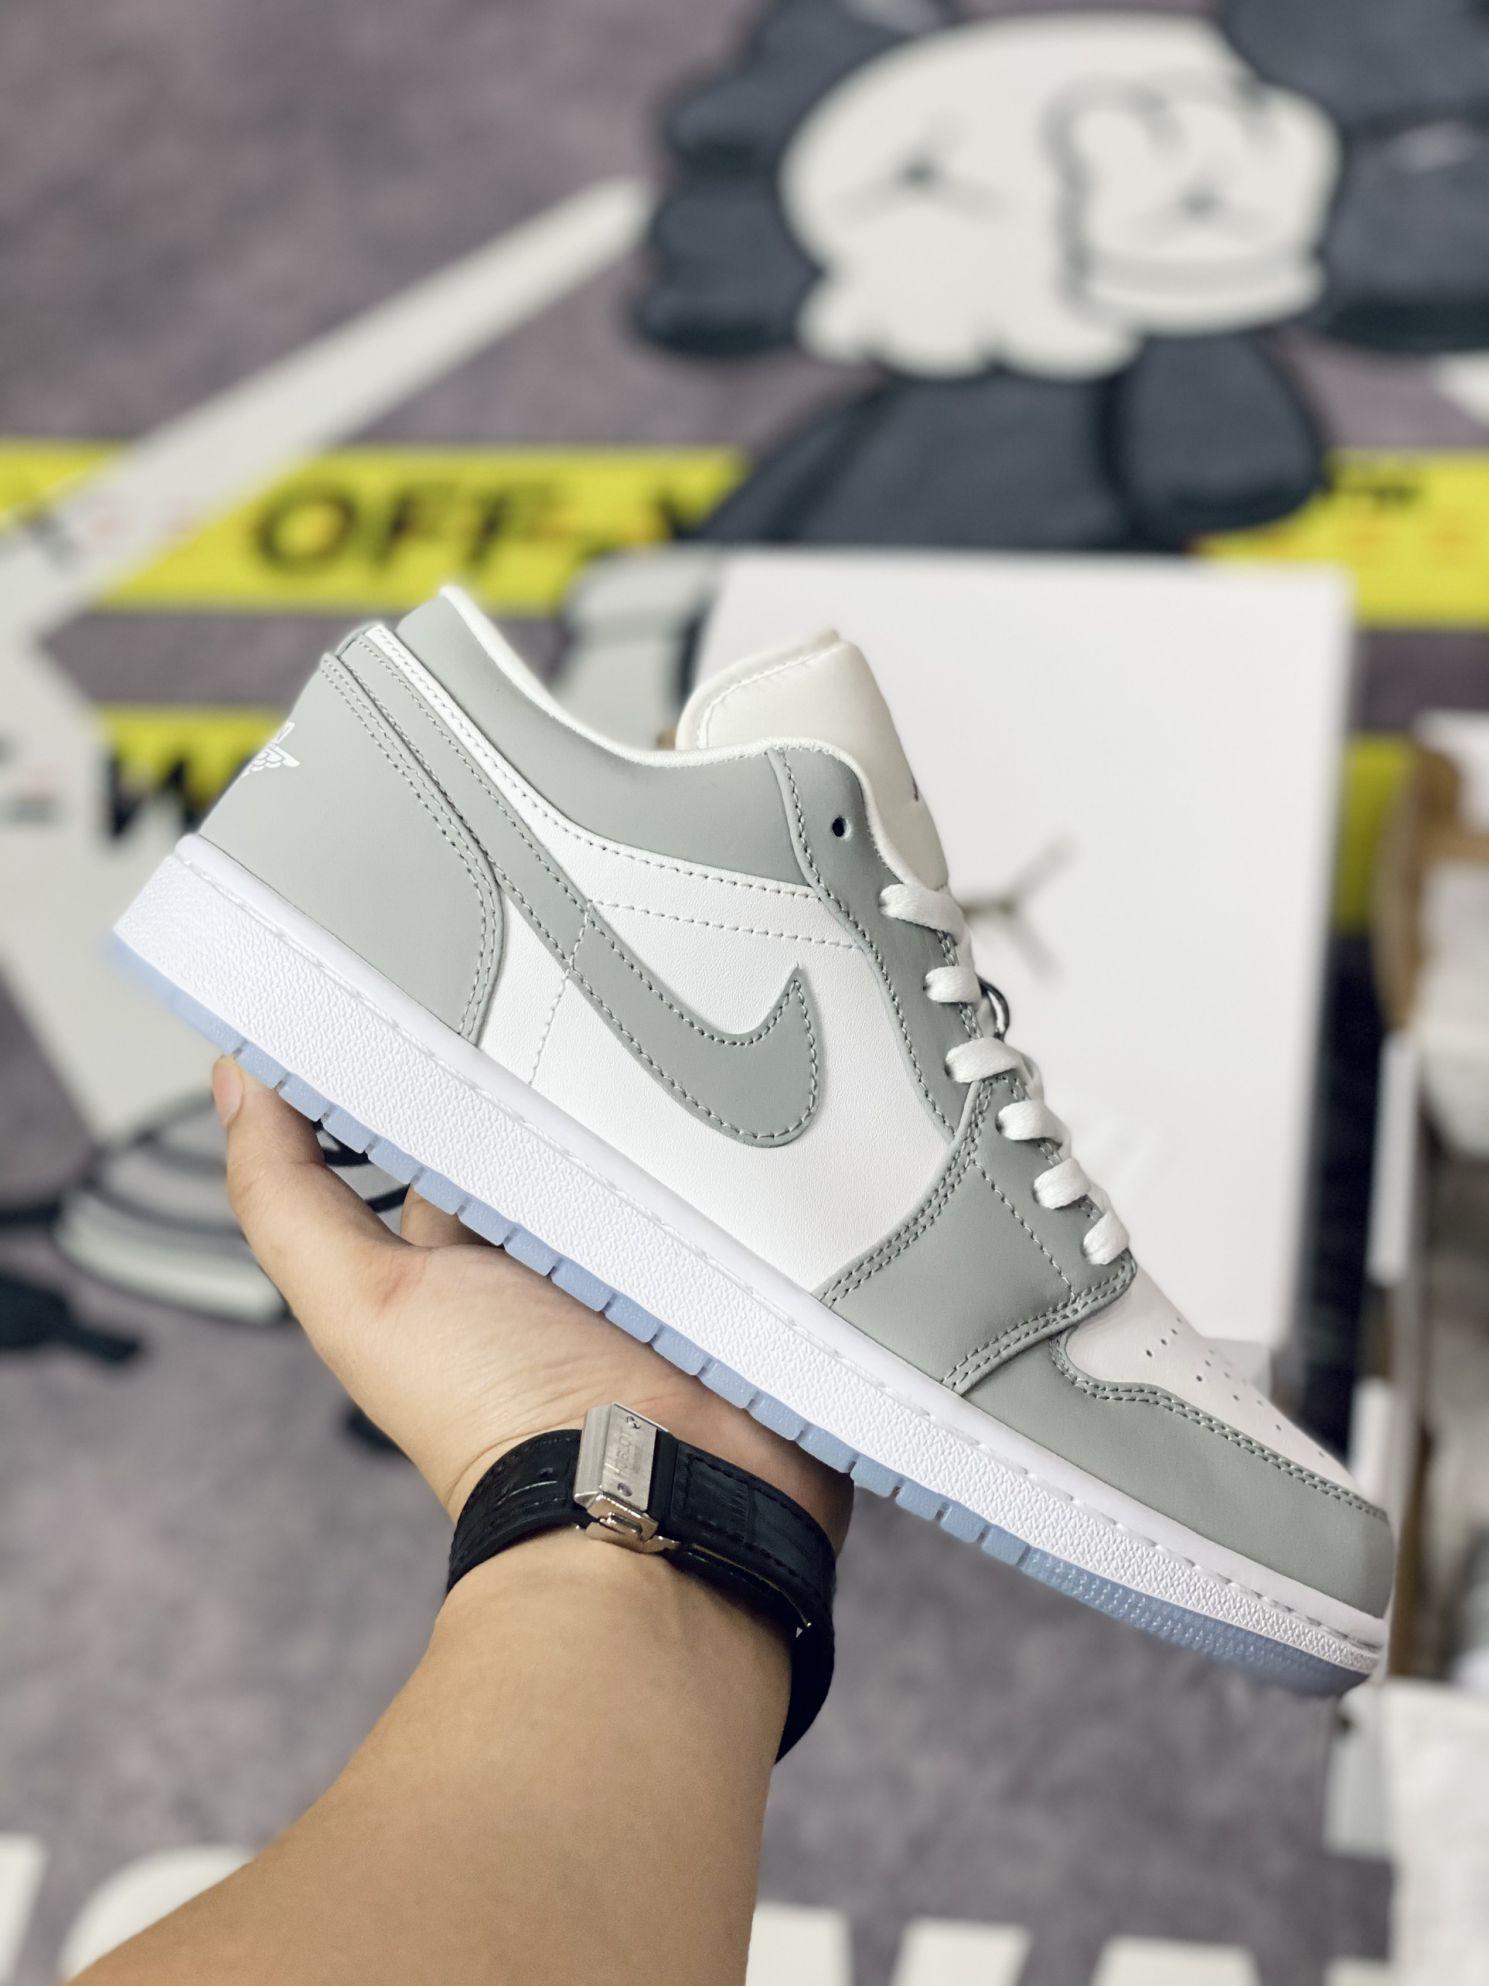 giày Jordan 1 Low Wolf Grey rep 1:1